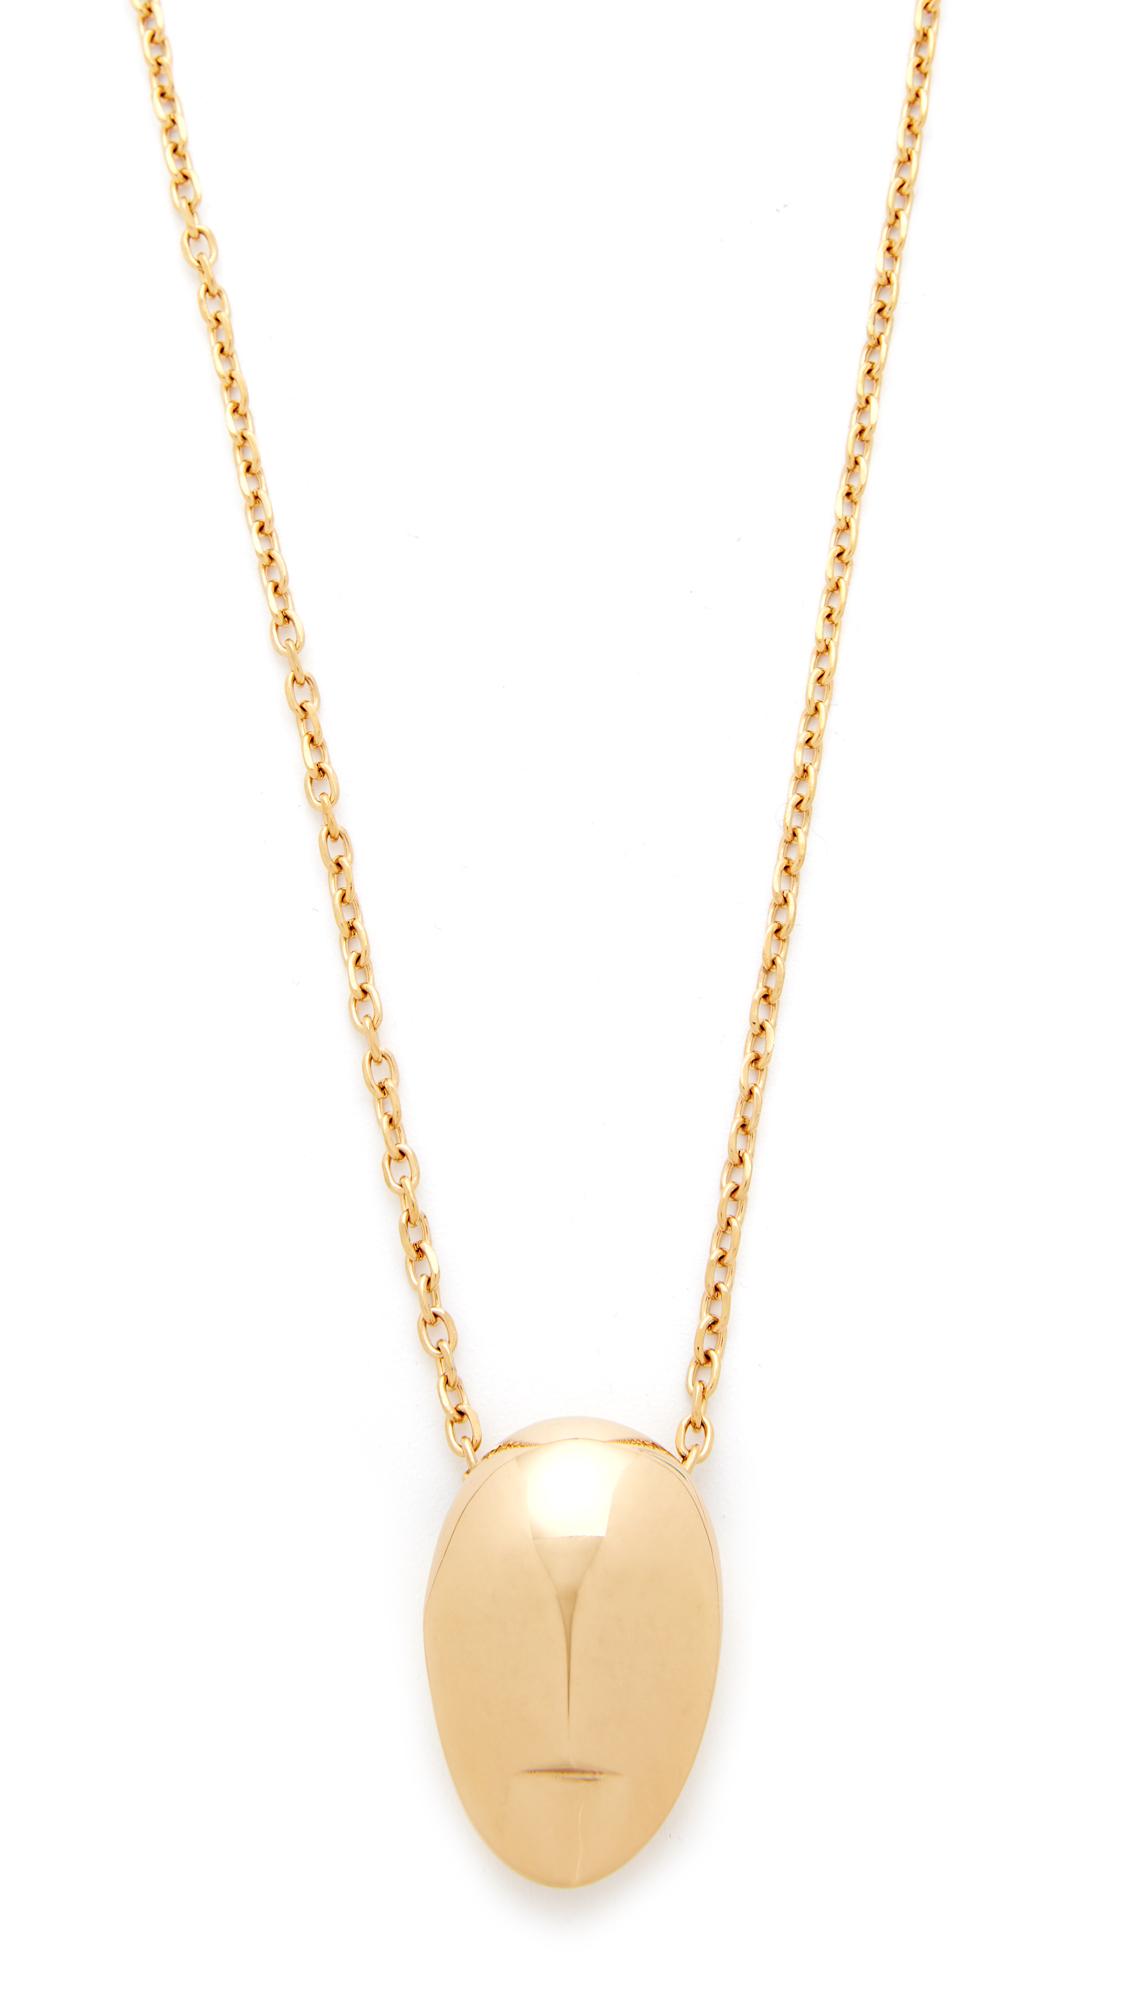 Amber Sceats Ezra Necklace - Gold